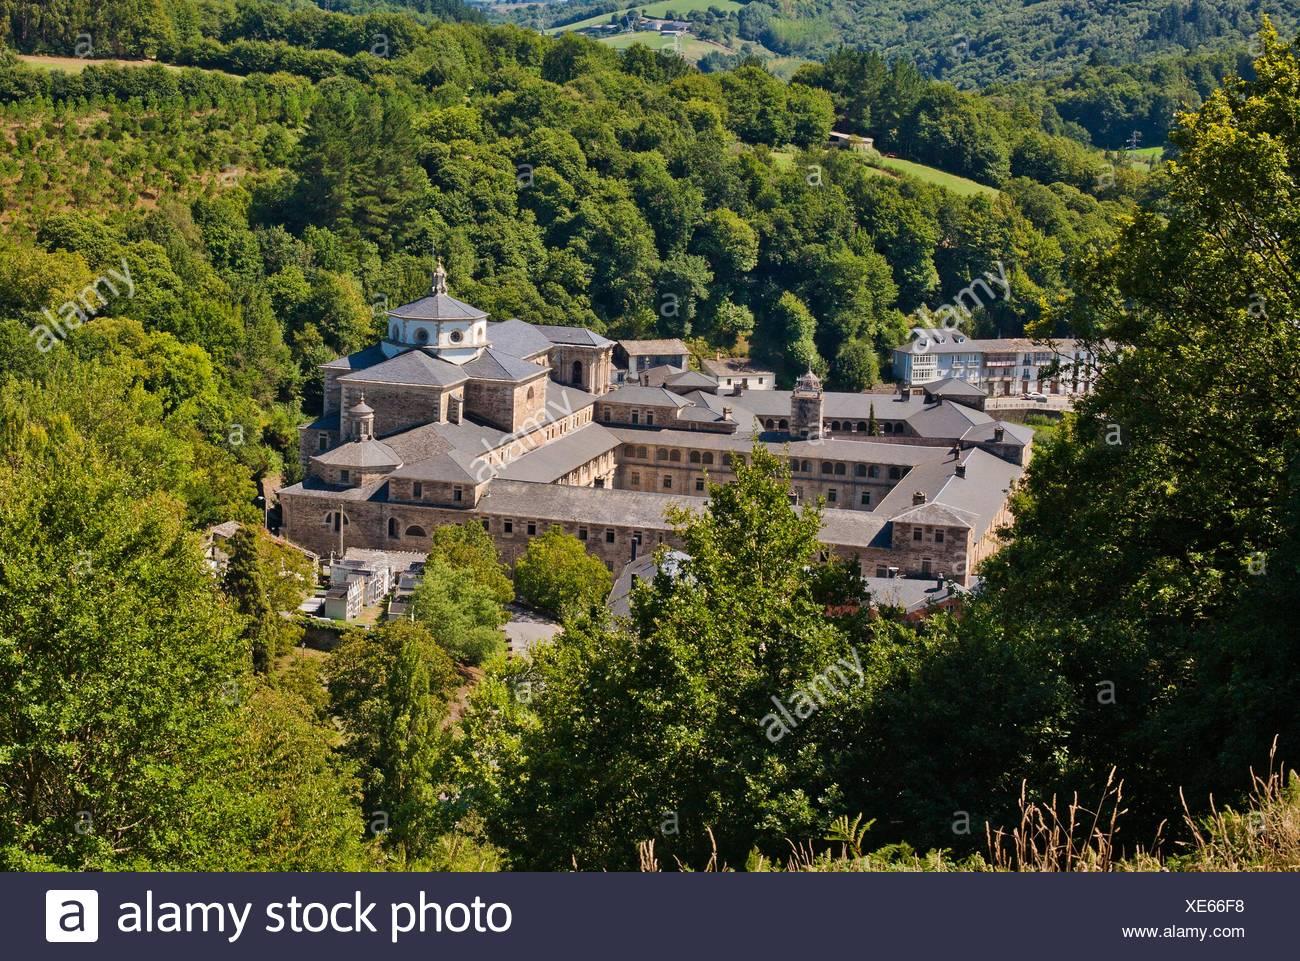 Monastery Of San Julian Samos Saint James Way Camino De Santiago French Way Lugo Province Galicia Spain Europe Stock Photo 284107916 Alamy